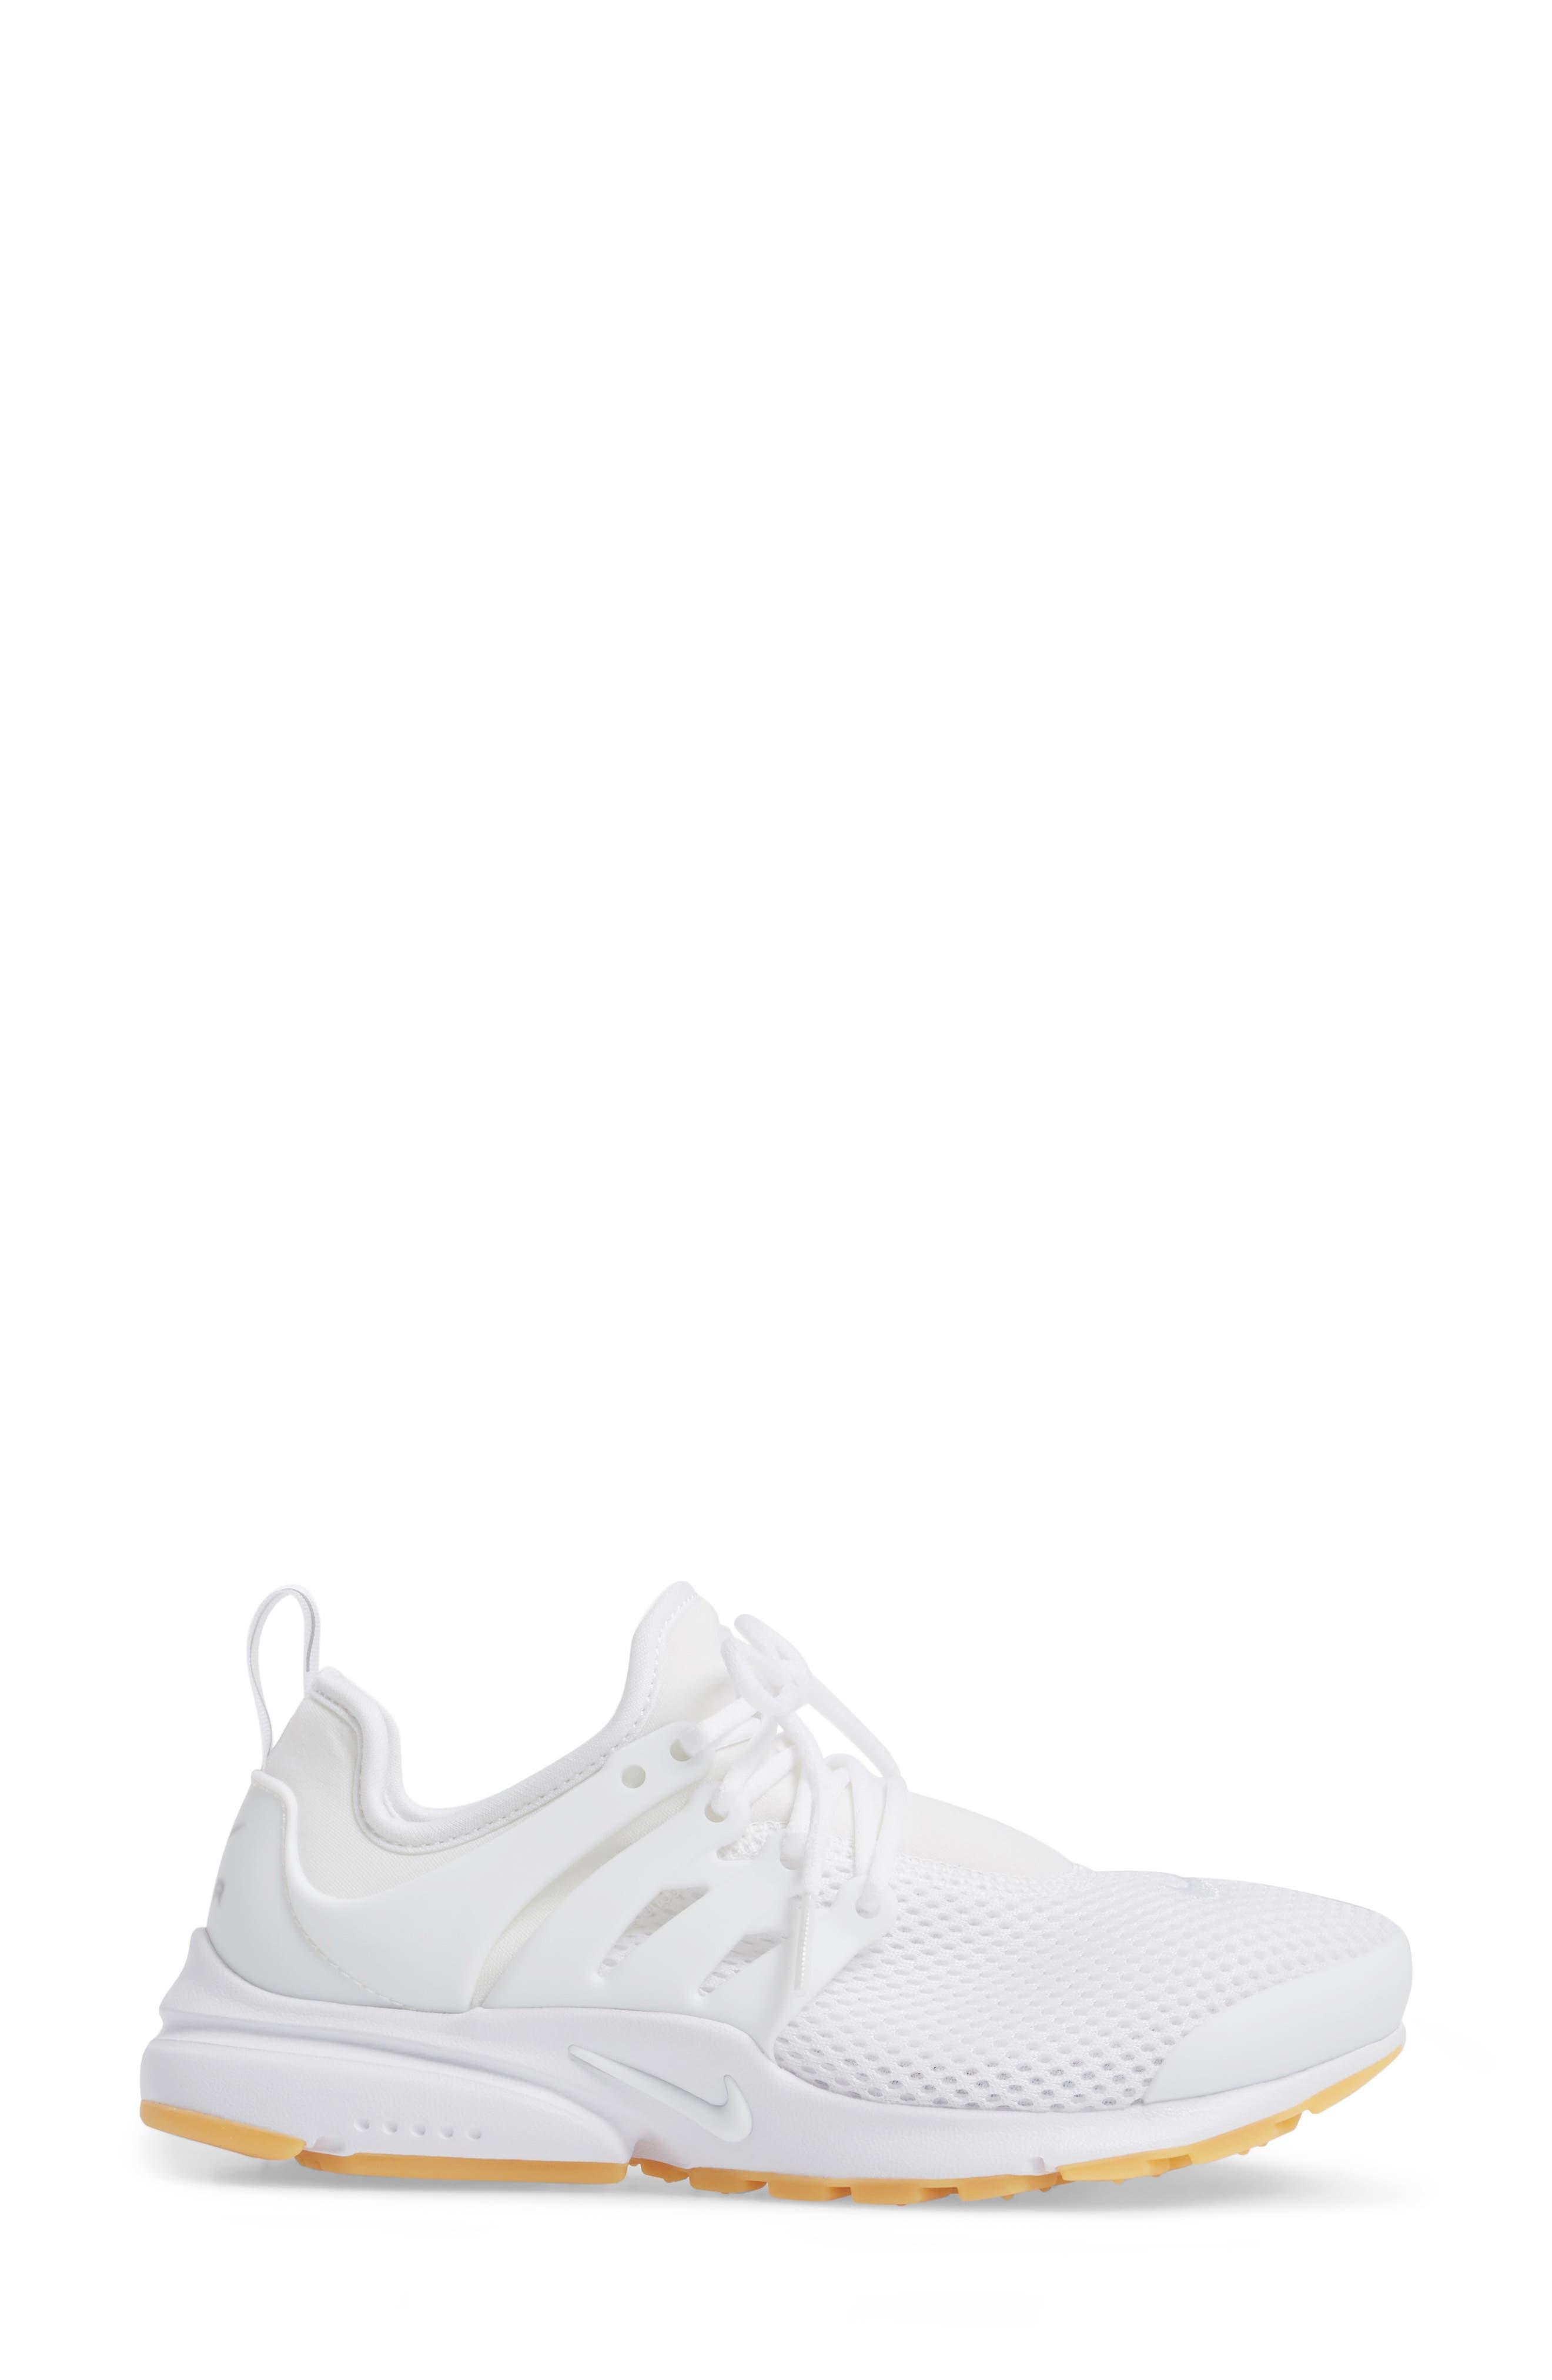 Air Presto Flyknit Ultra Sneaker,                             Alternate thumbnail 3, color,                             White/ Gum Yellow/ Wolf Grey